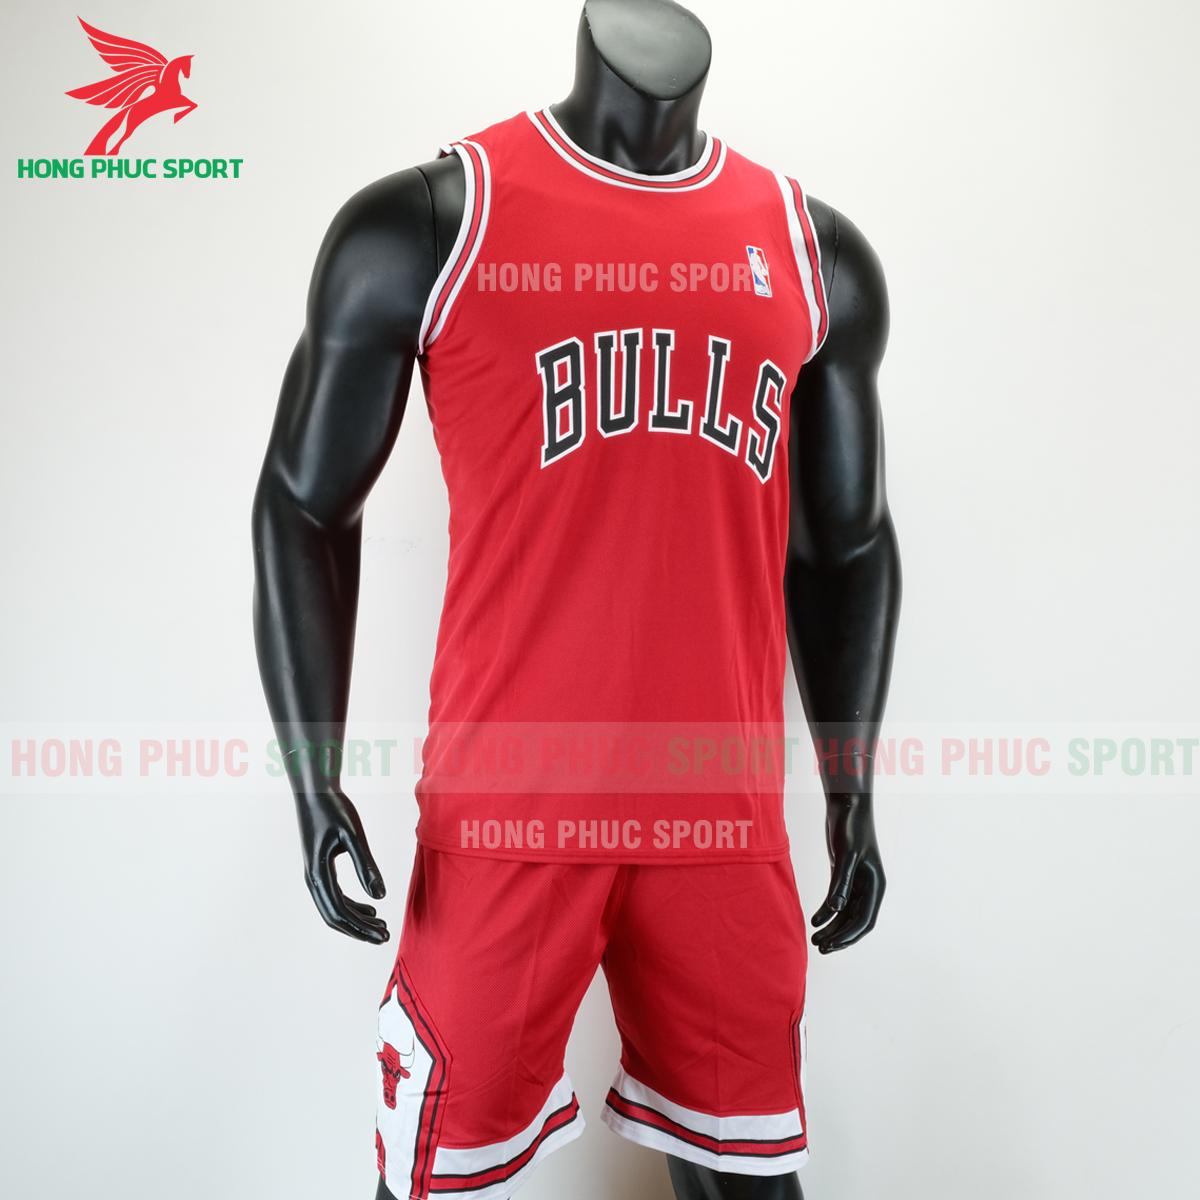 https://cdn.hongphucsport.com/unsafe/s4.shopbay.vn/files/285/ao-bong-ro-bulls-mau-do-1-5f76dc07d8cd2.png